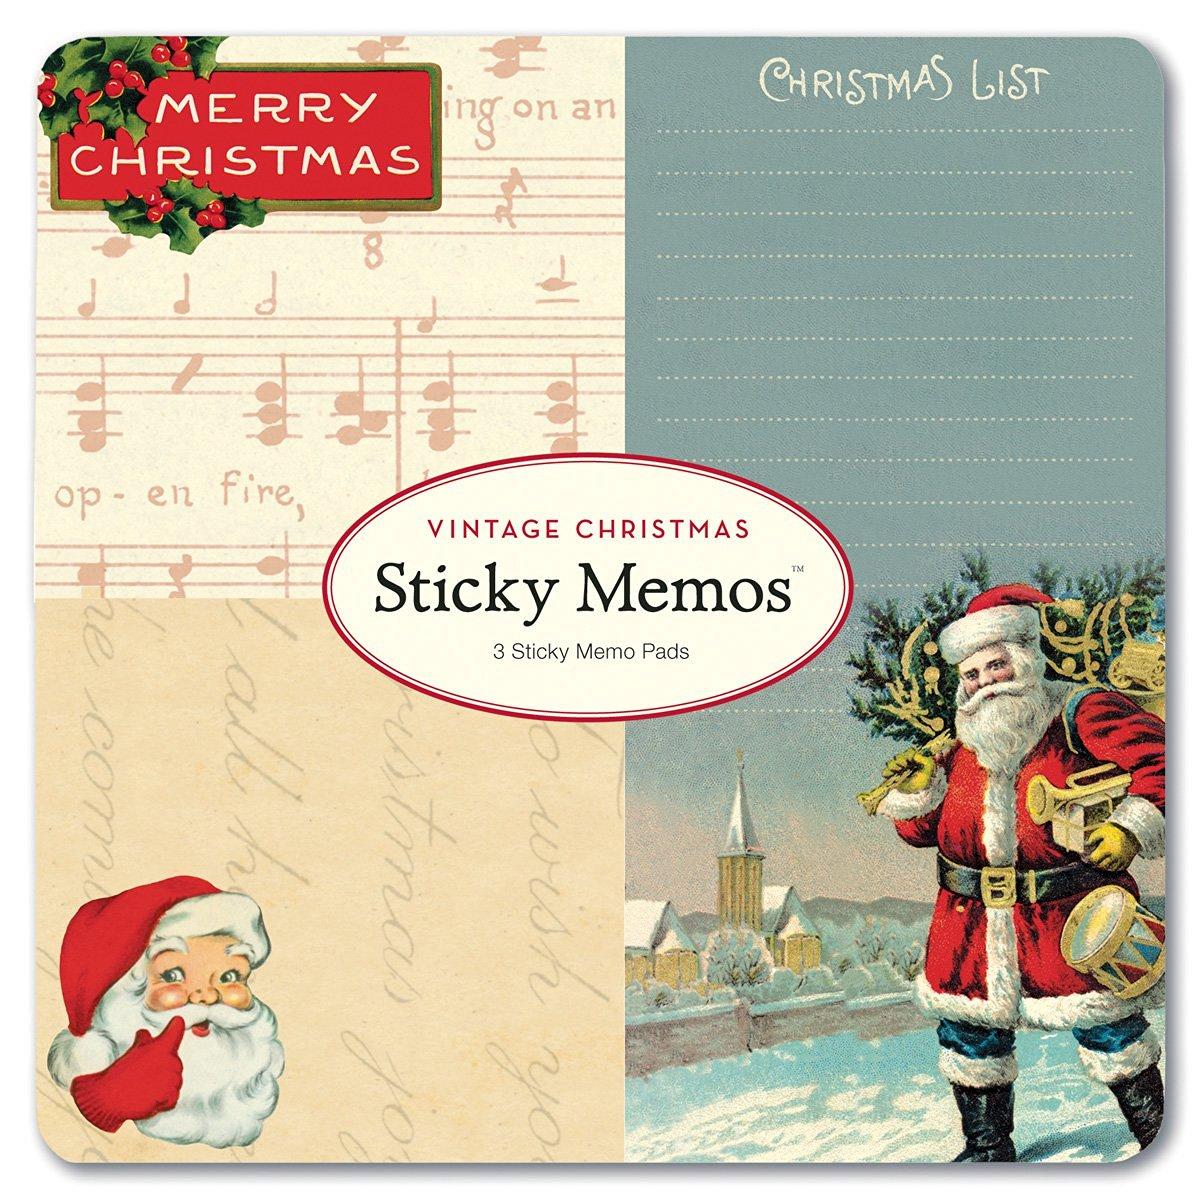 Cavallini Papers Sticky Memo Pads Vintage Chritmas, 3 Sticky Memo Pads